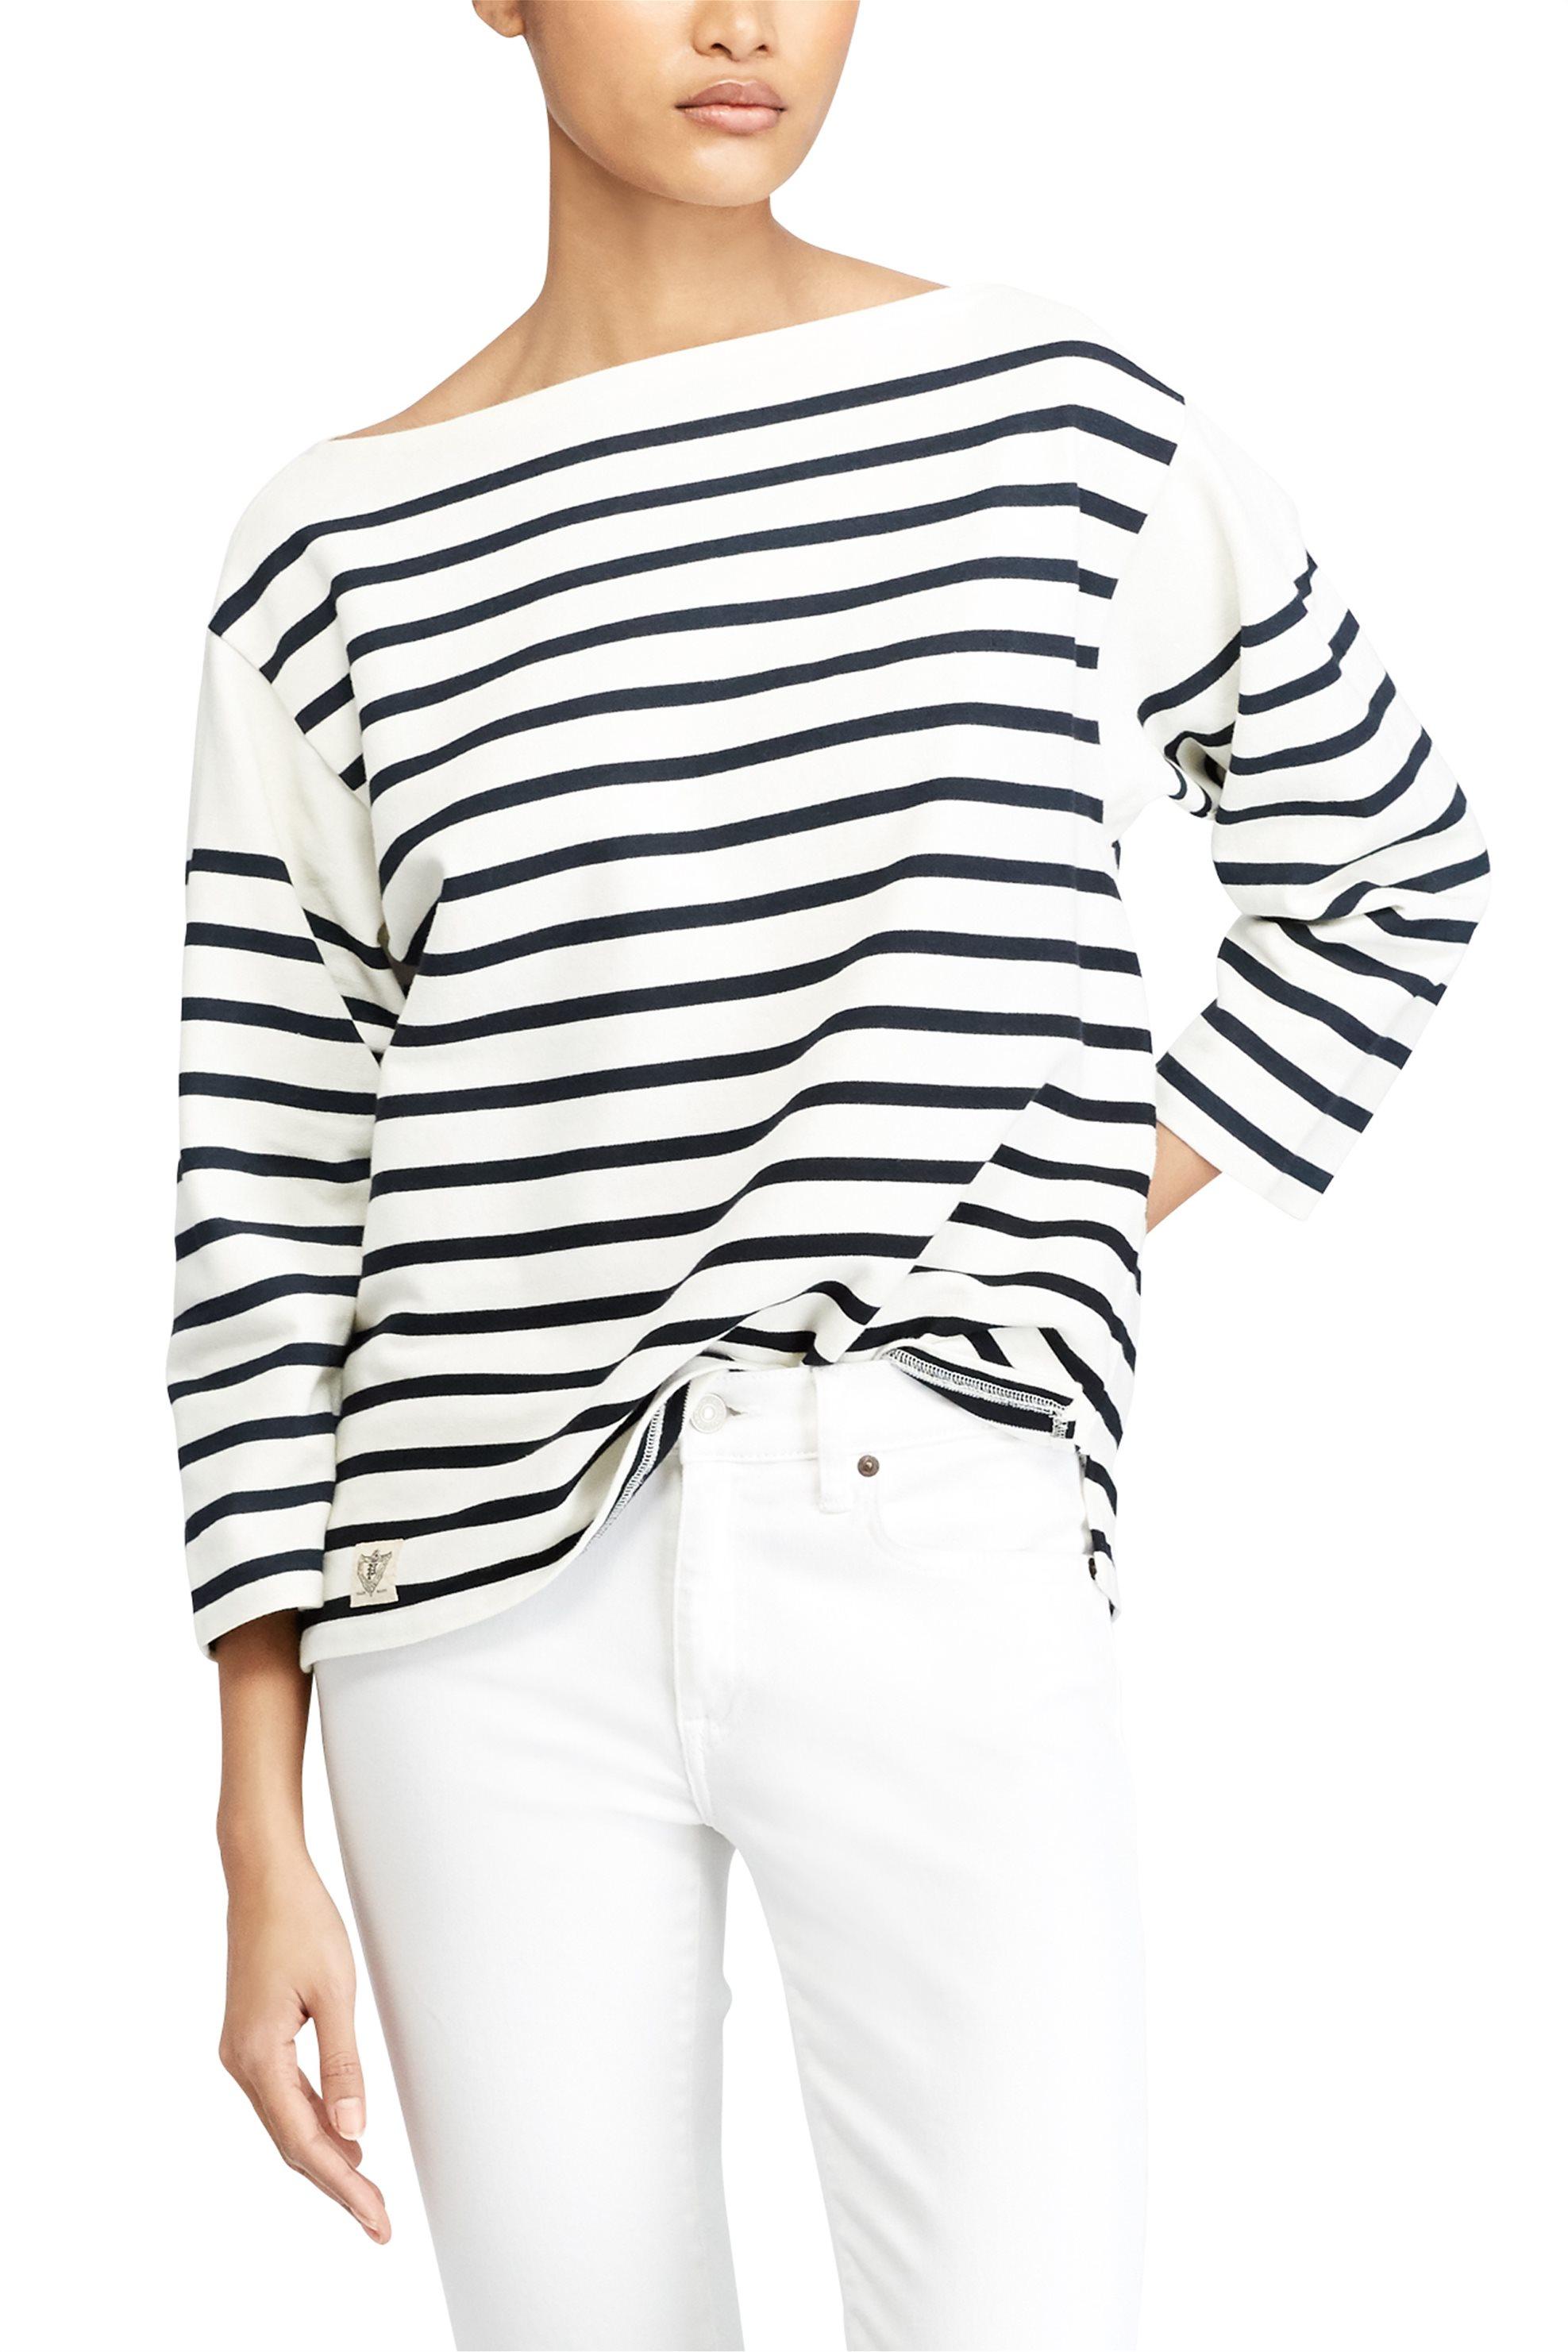 Polo Ralph Lauren γυναικεία μπλούζα ριγέ Concert Jersey Graphic T-Shirt - 211704 γυναικα   ρουχα   tops   μπλούζες   casual